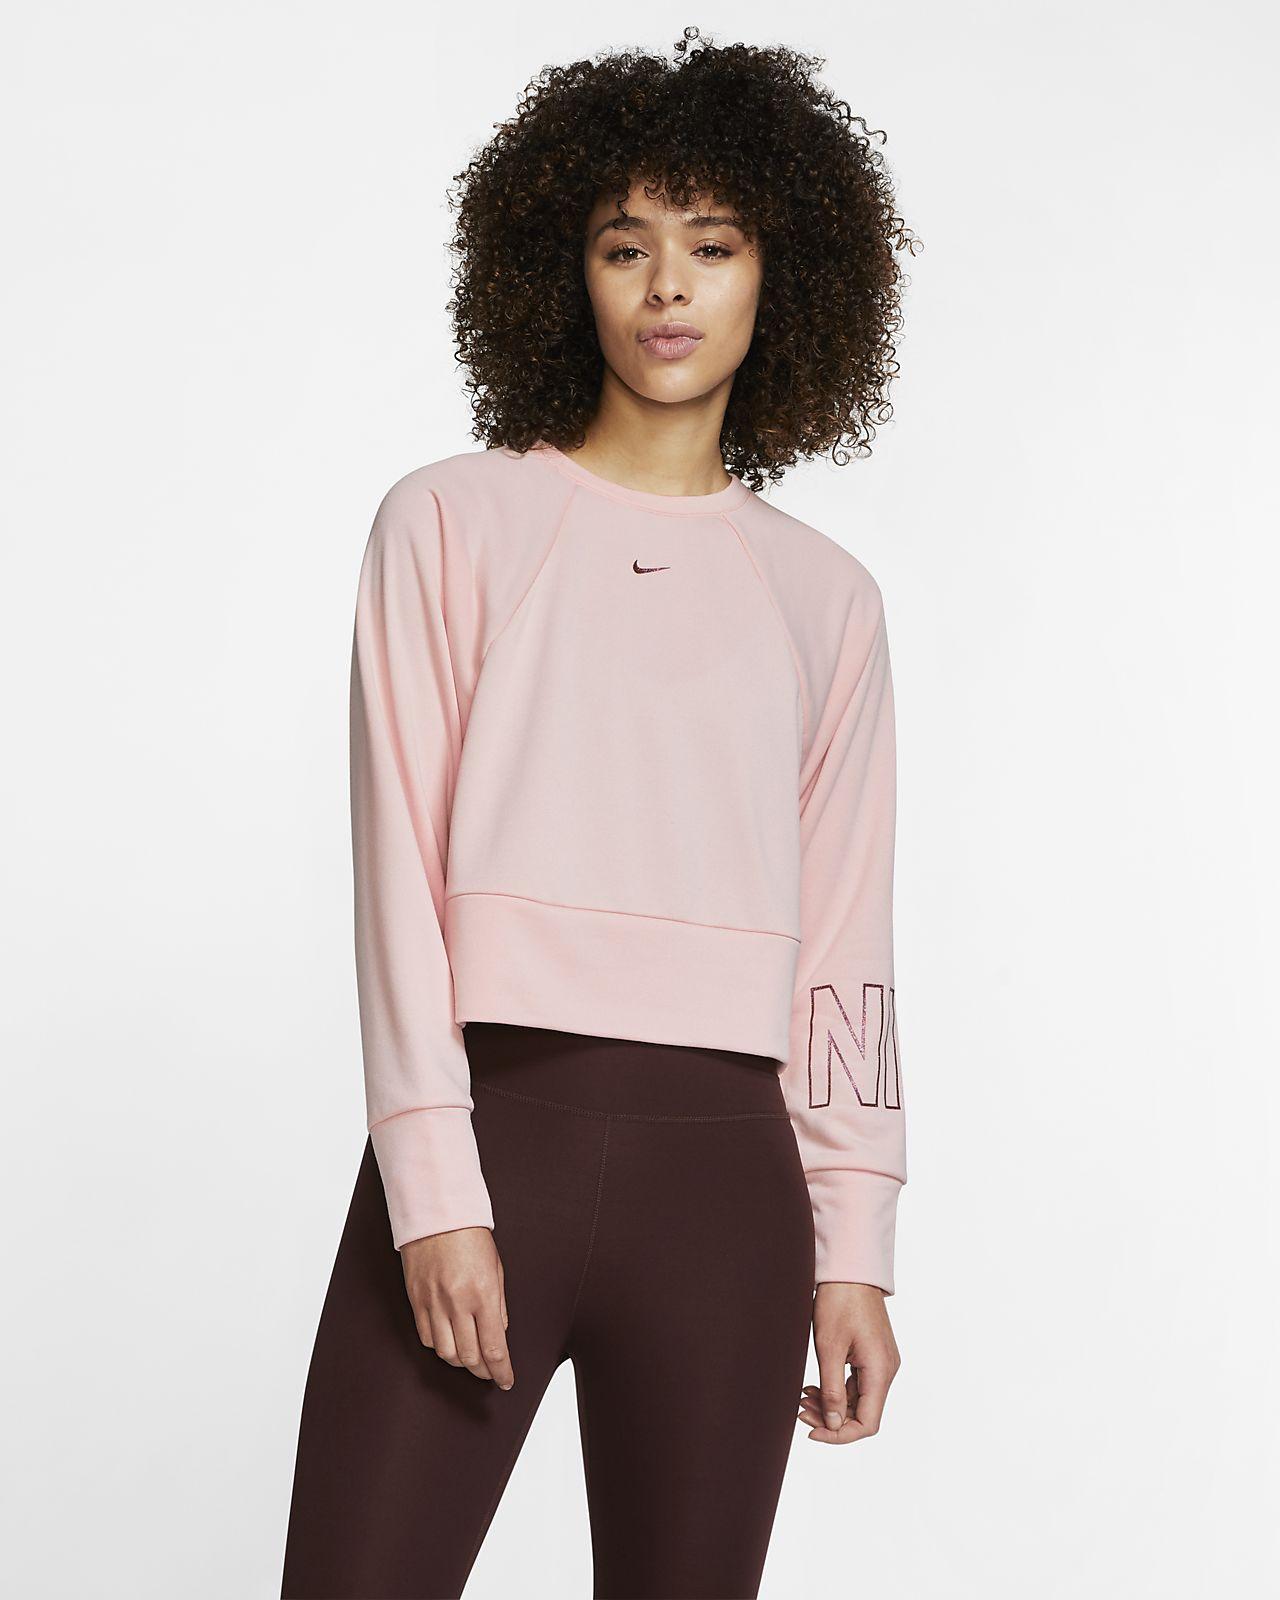 Damska dzianinowa bluza treningowa z grafiką Nike Dri-FIT Get Fit